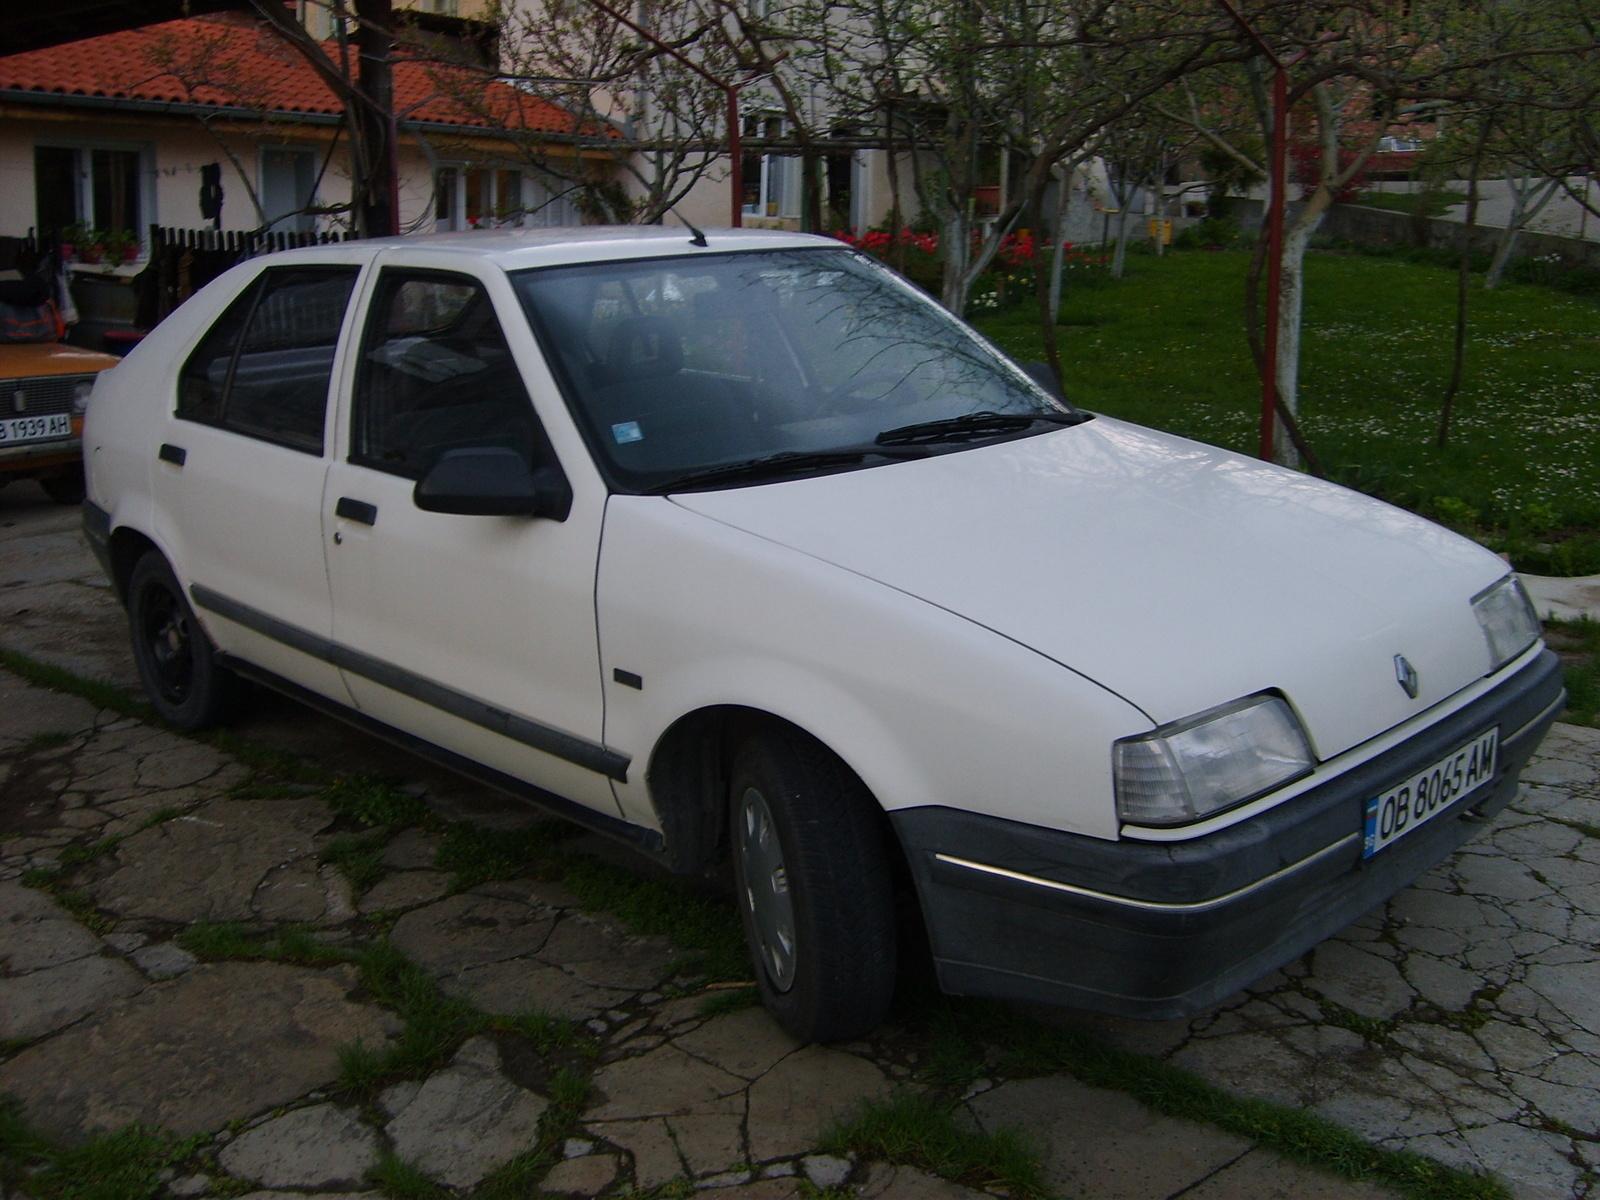 Bien connu 1989 Renault 19 - Overview - CarGurus VT81